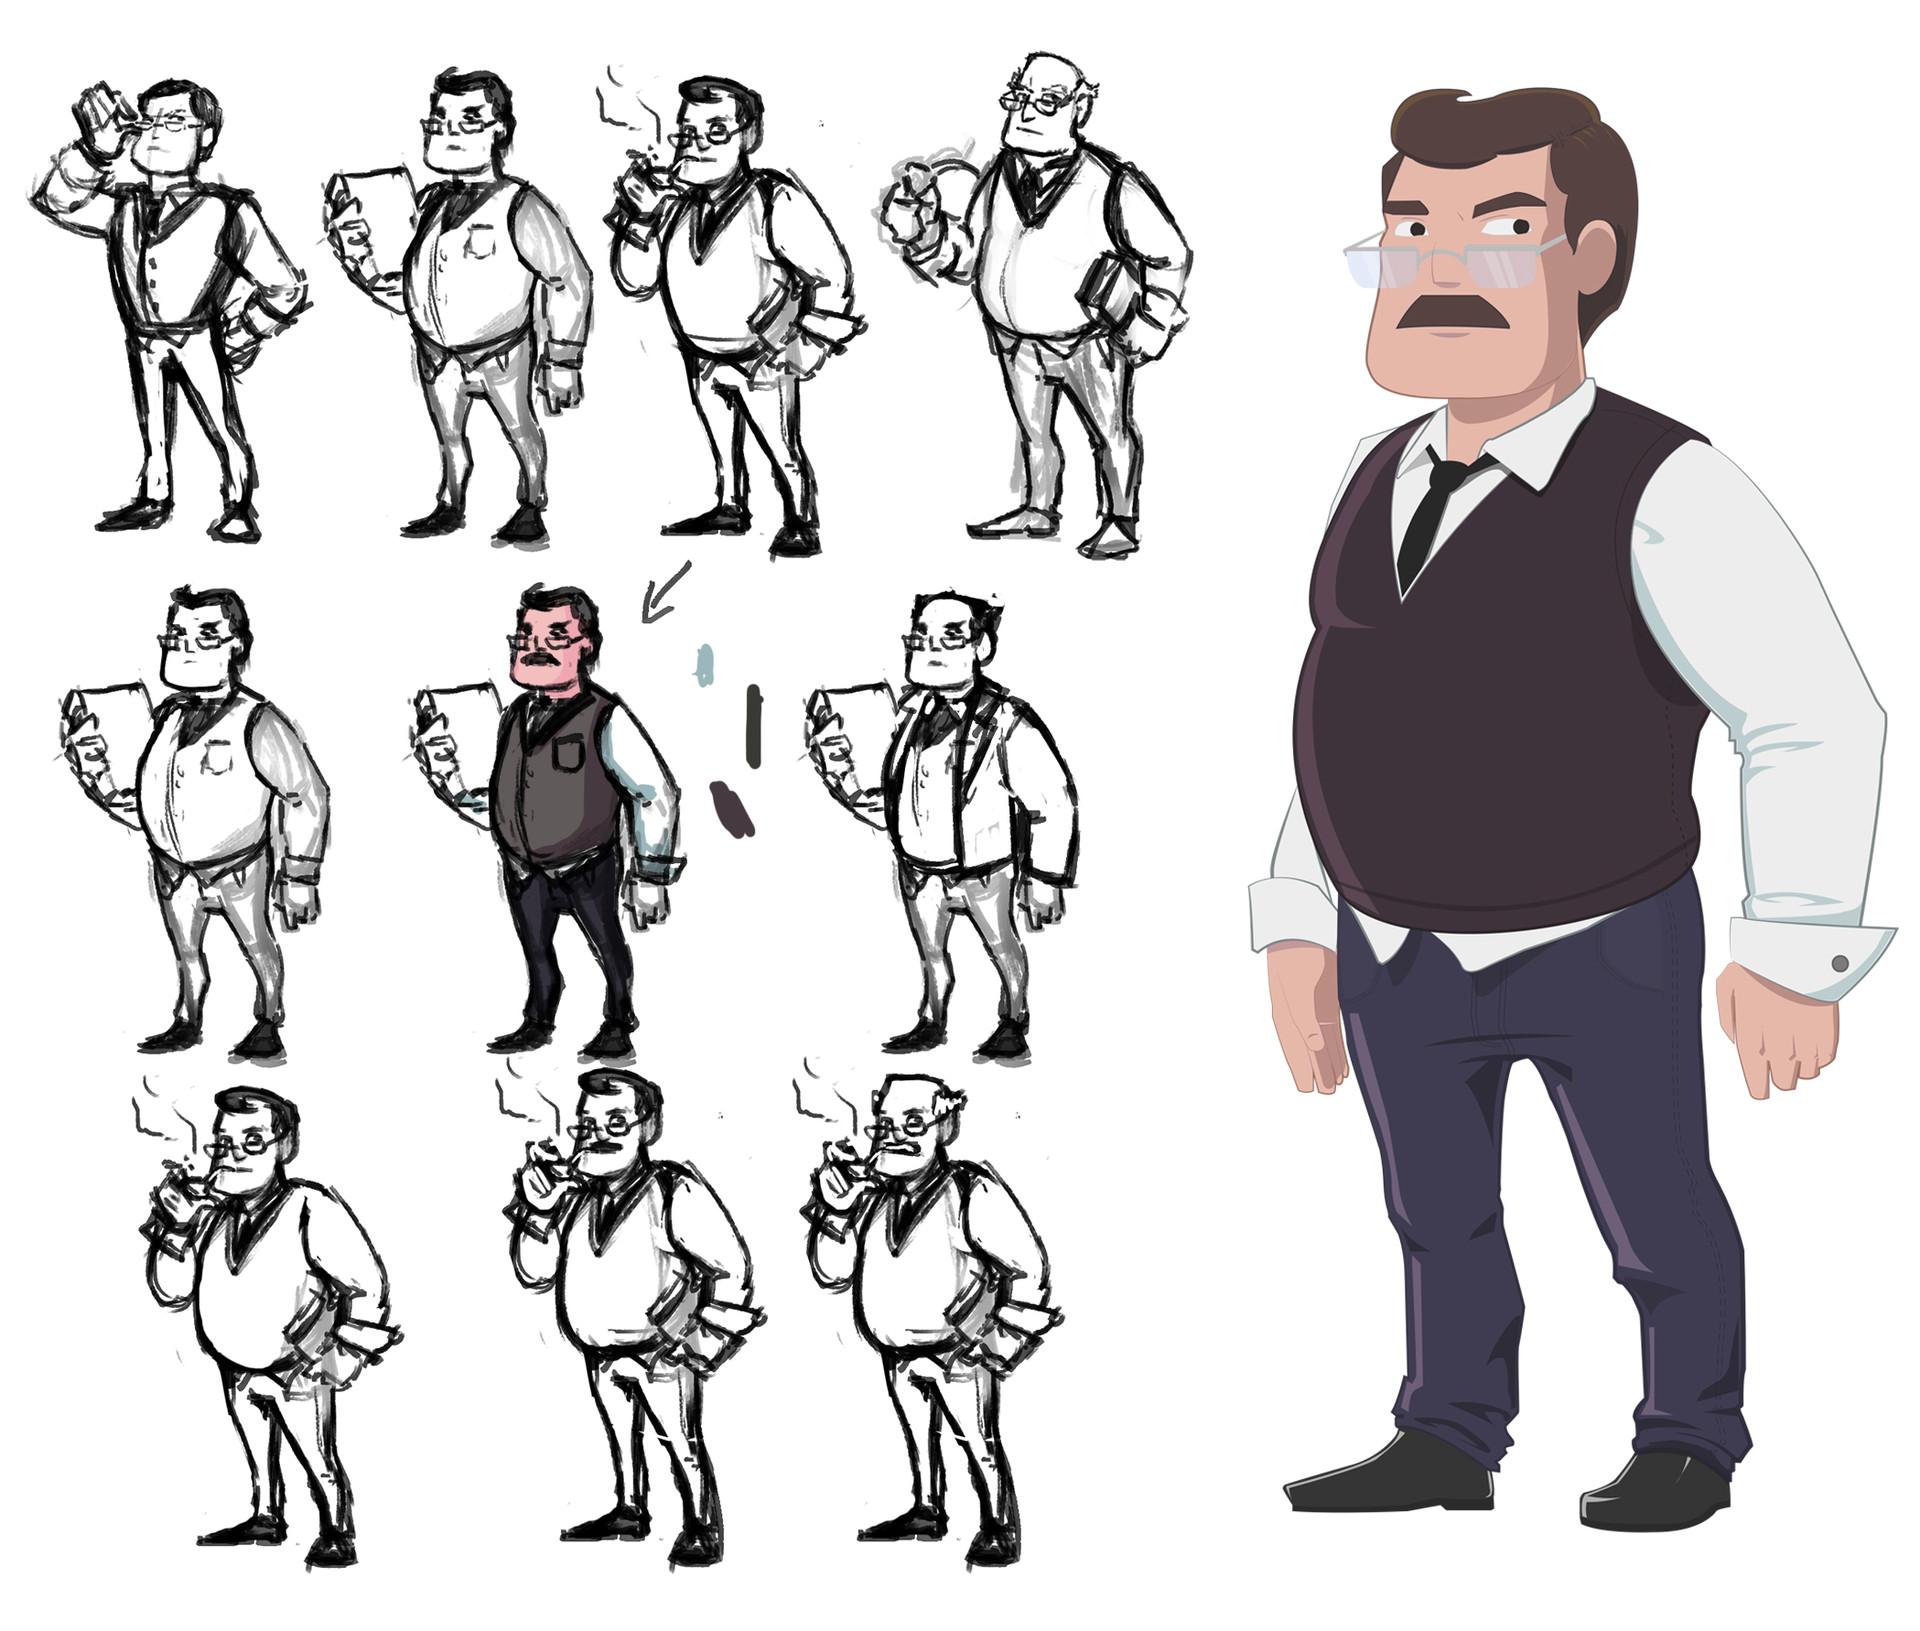 Felipe sanz professor sketch